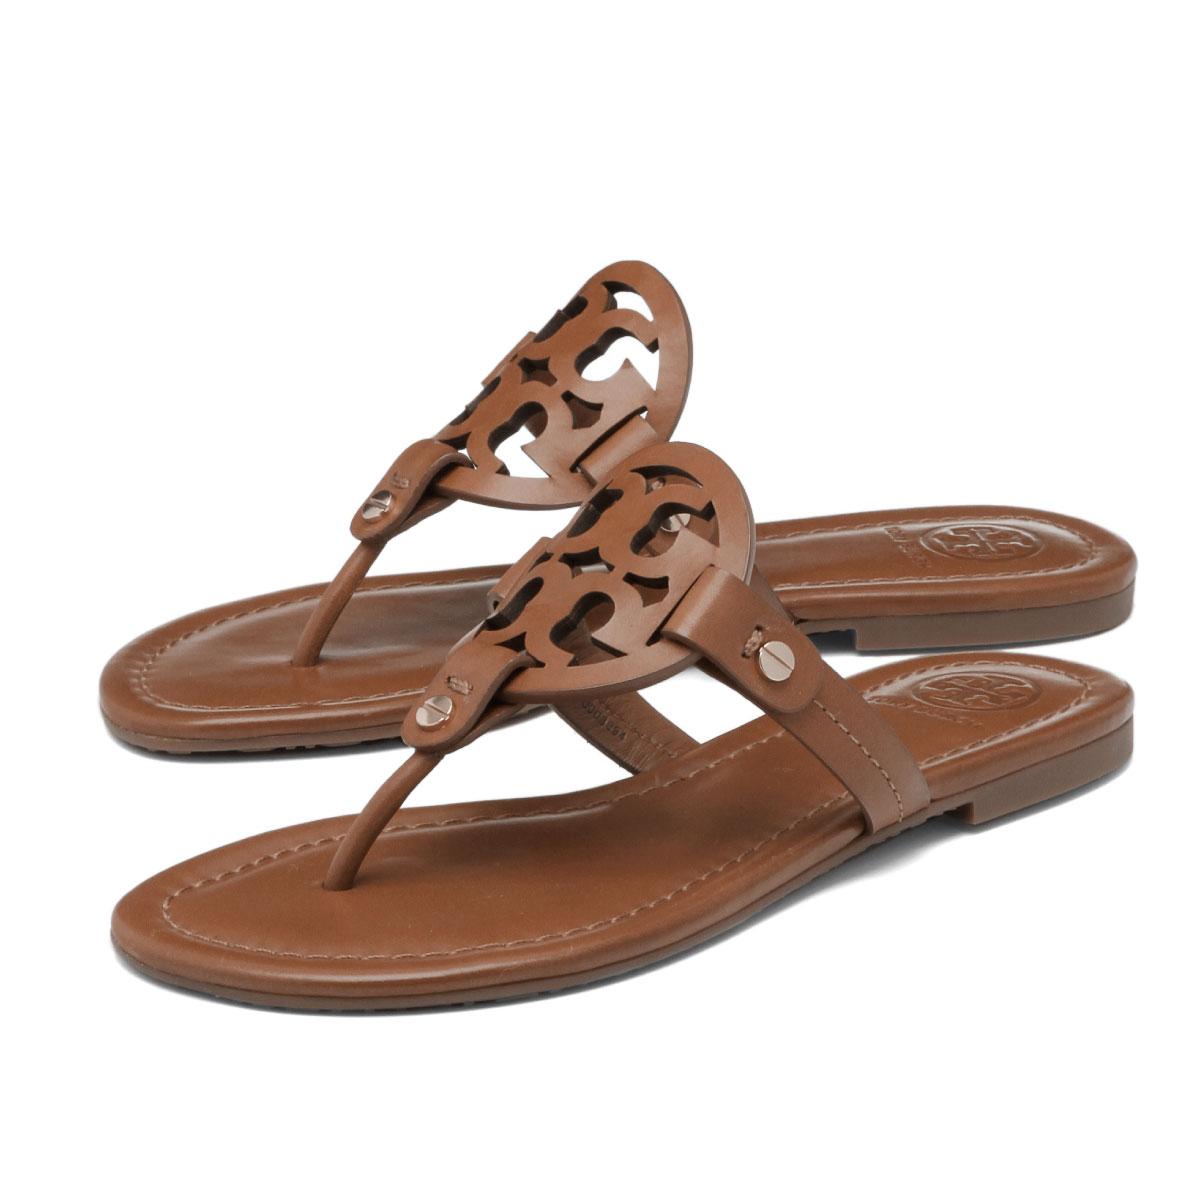 importshopdouble | Rakuten Global Market: Tolly Birch TORY BURCH shoes Lady's 50008694 204 tong sandals MILLER mirror VINTAGE VACHETTA brown